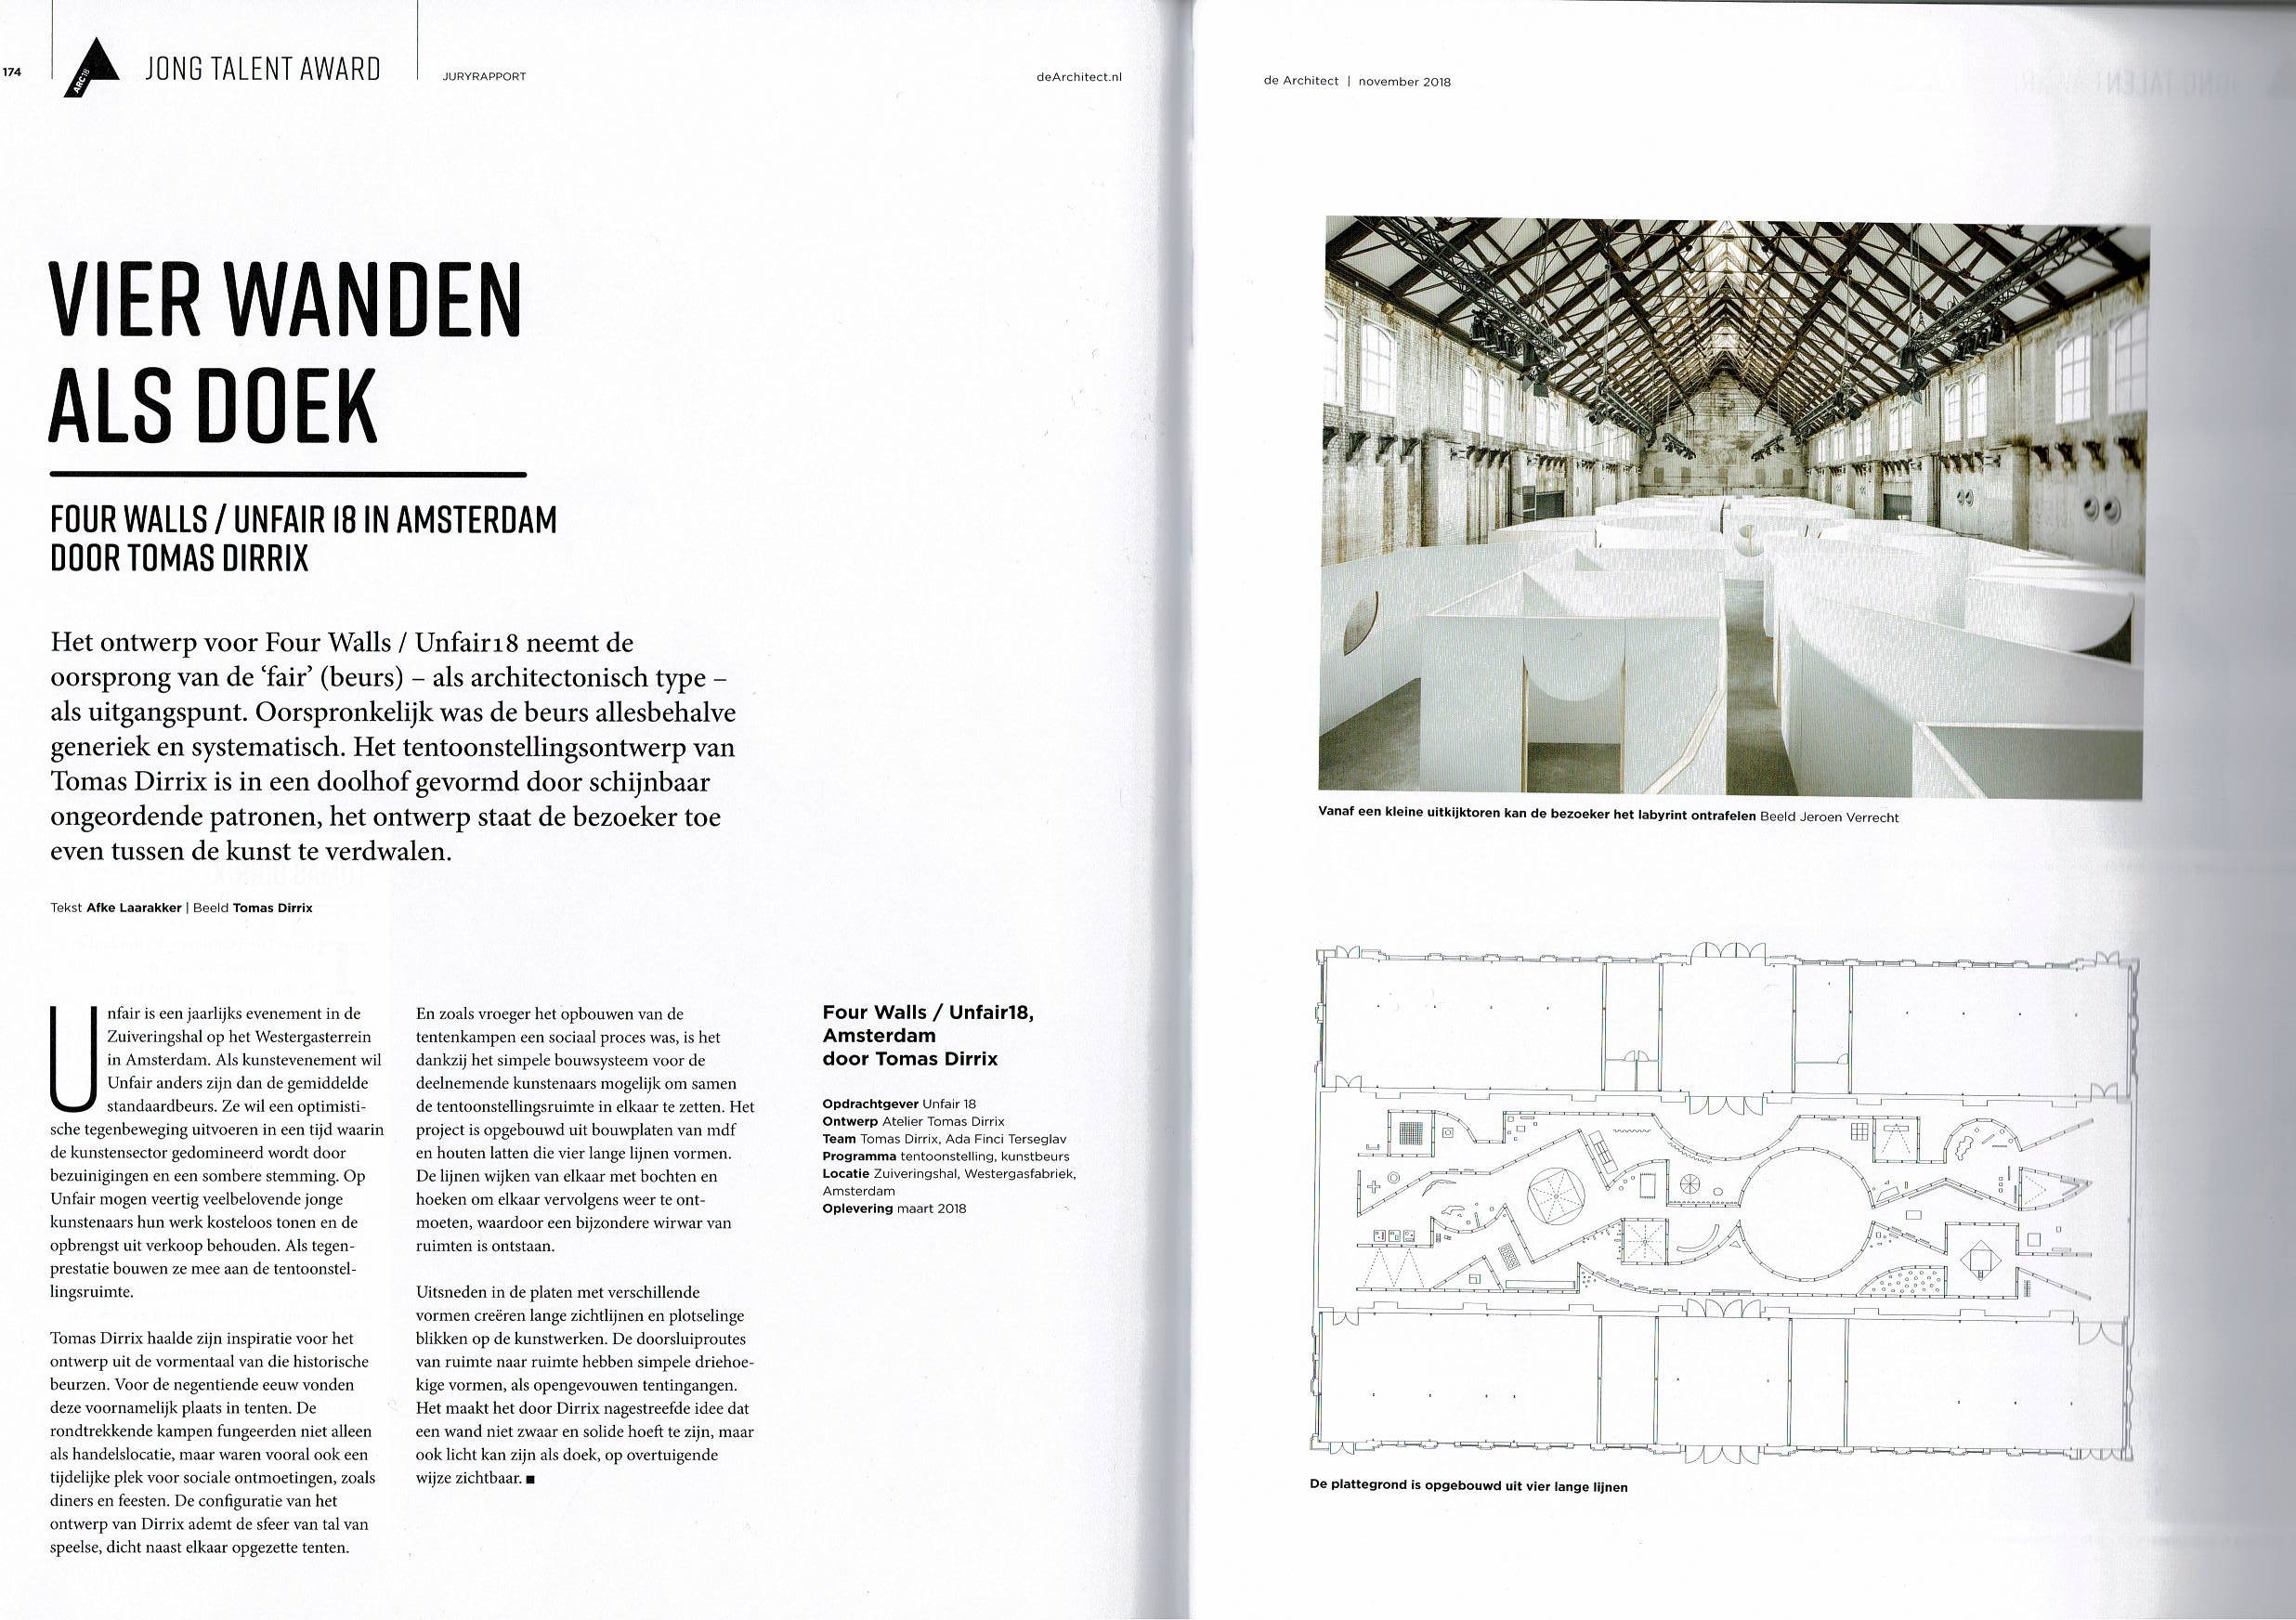 Article in Dutch magazine 'De Architect' - Dec/Jan 2018